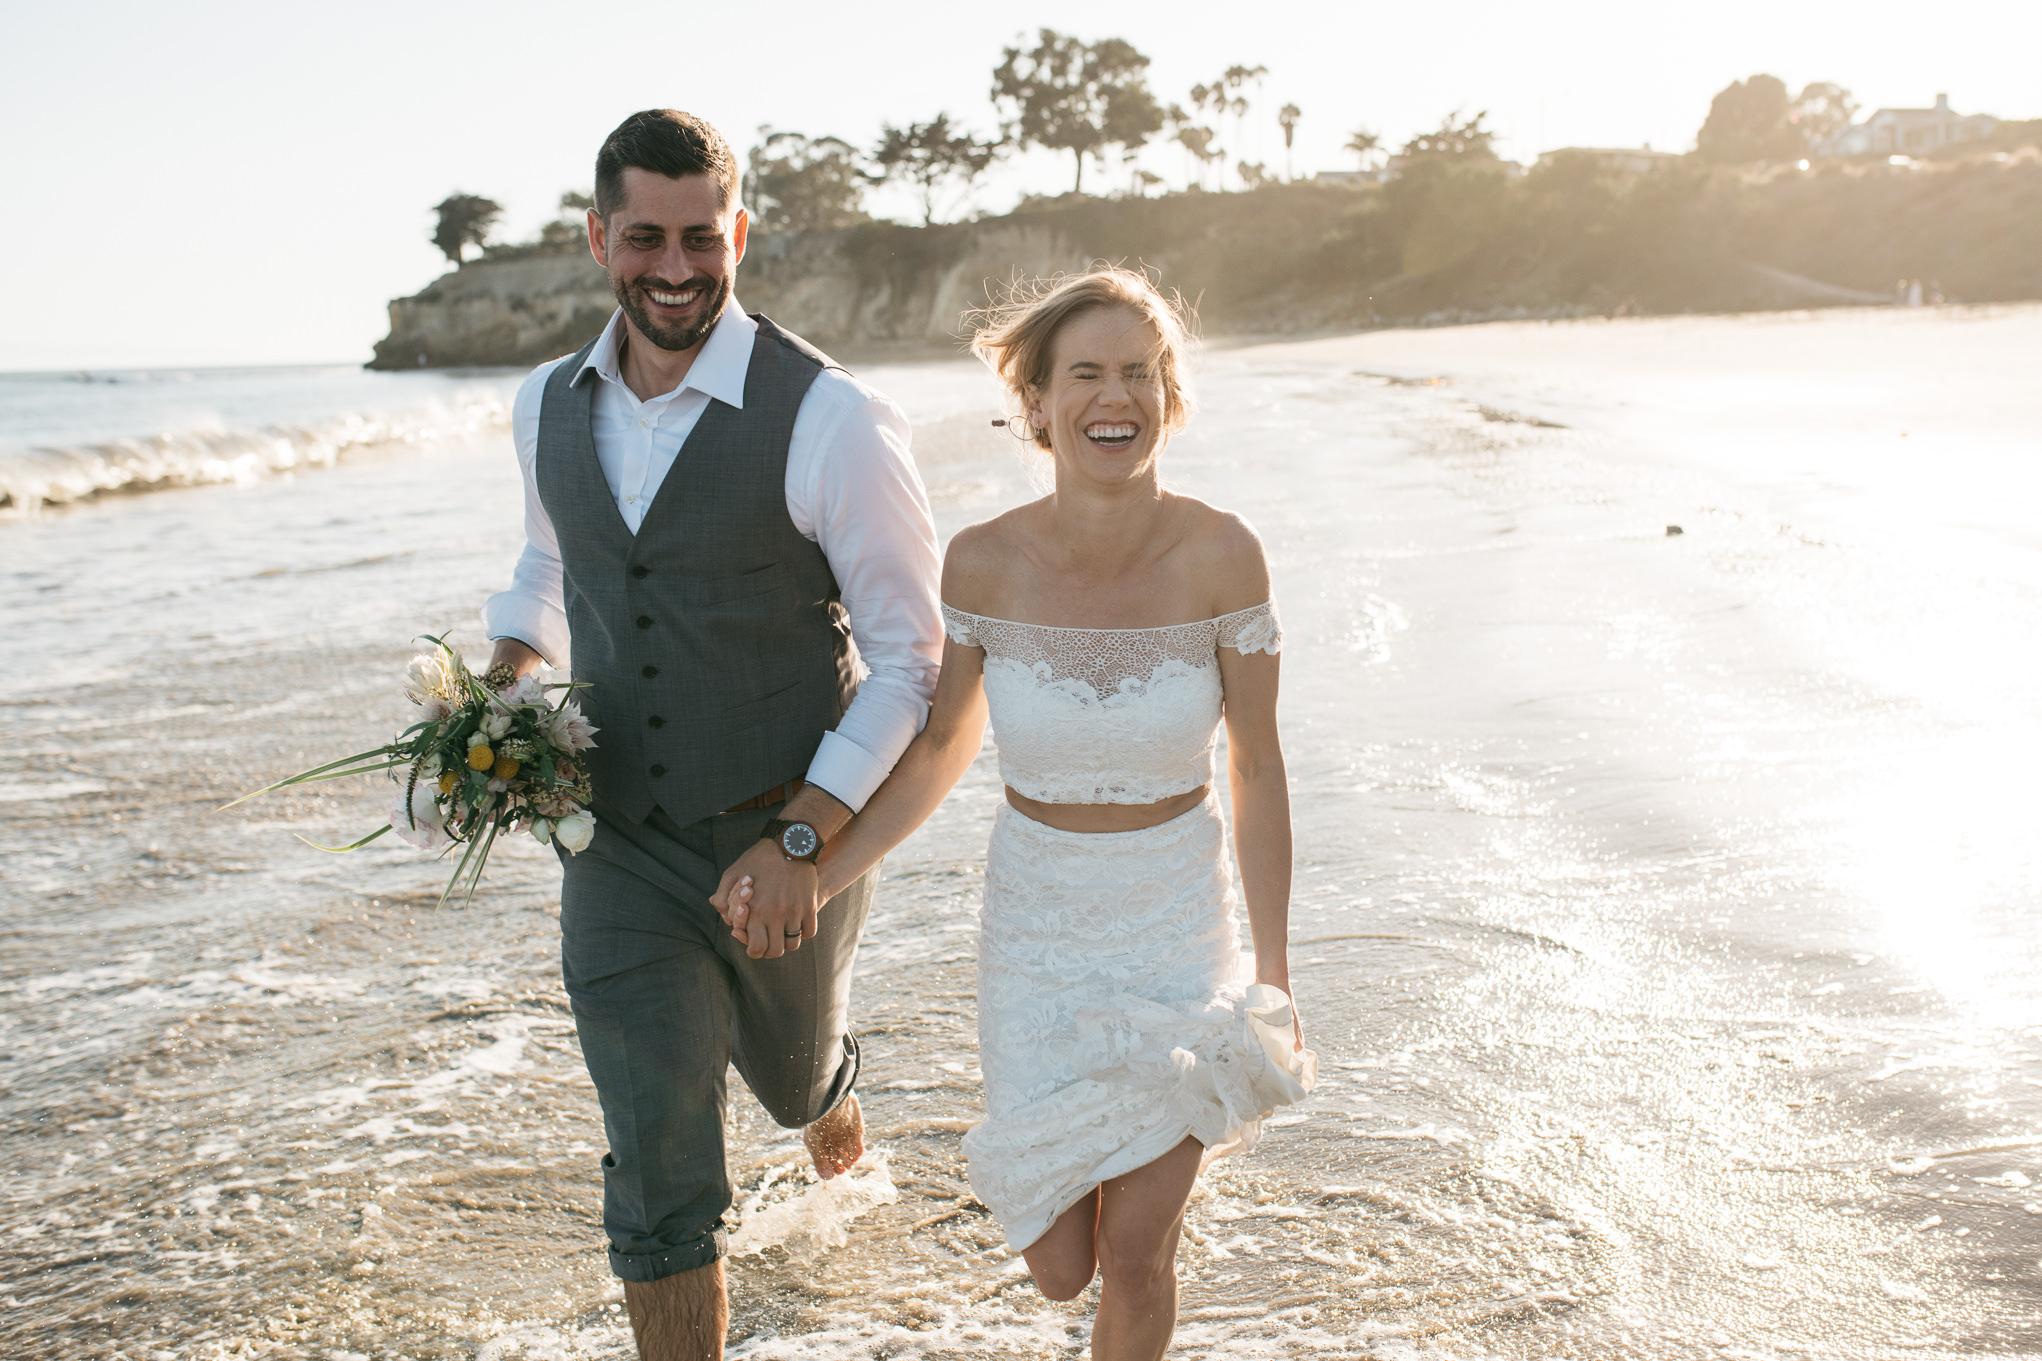 612_ONL_Jenny_Ken_Wedding_Trevor_Hooper_Photo.jpg